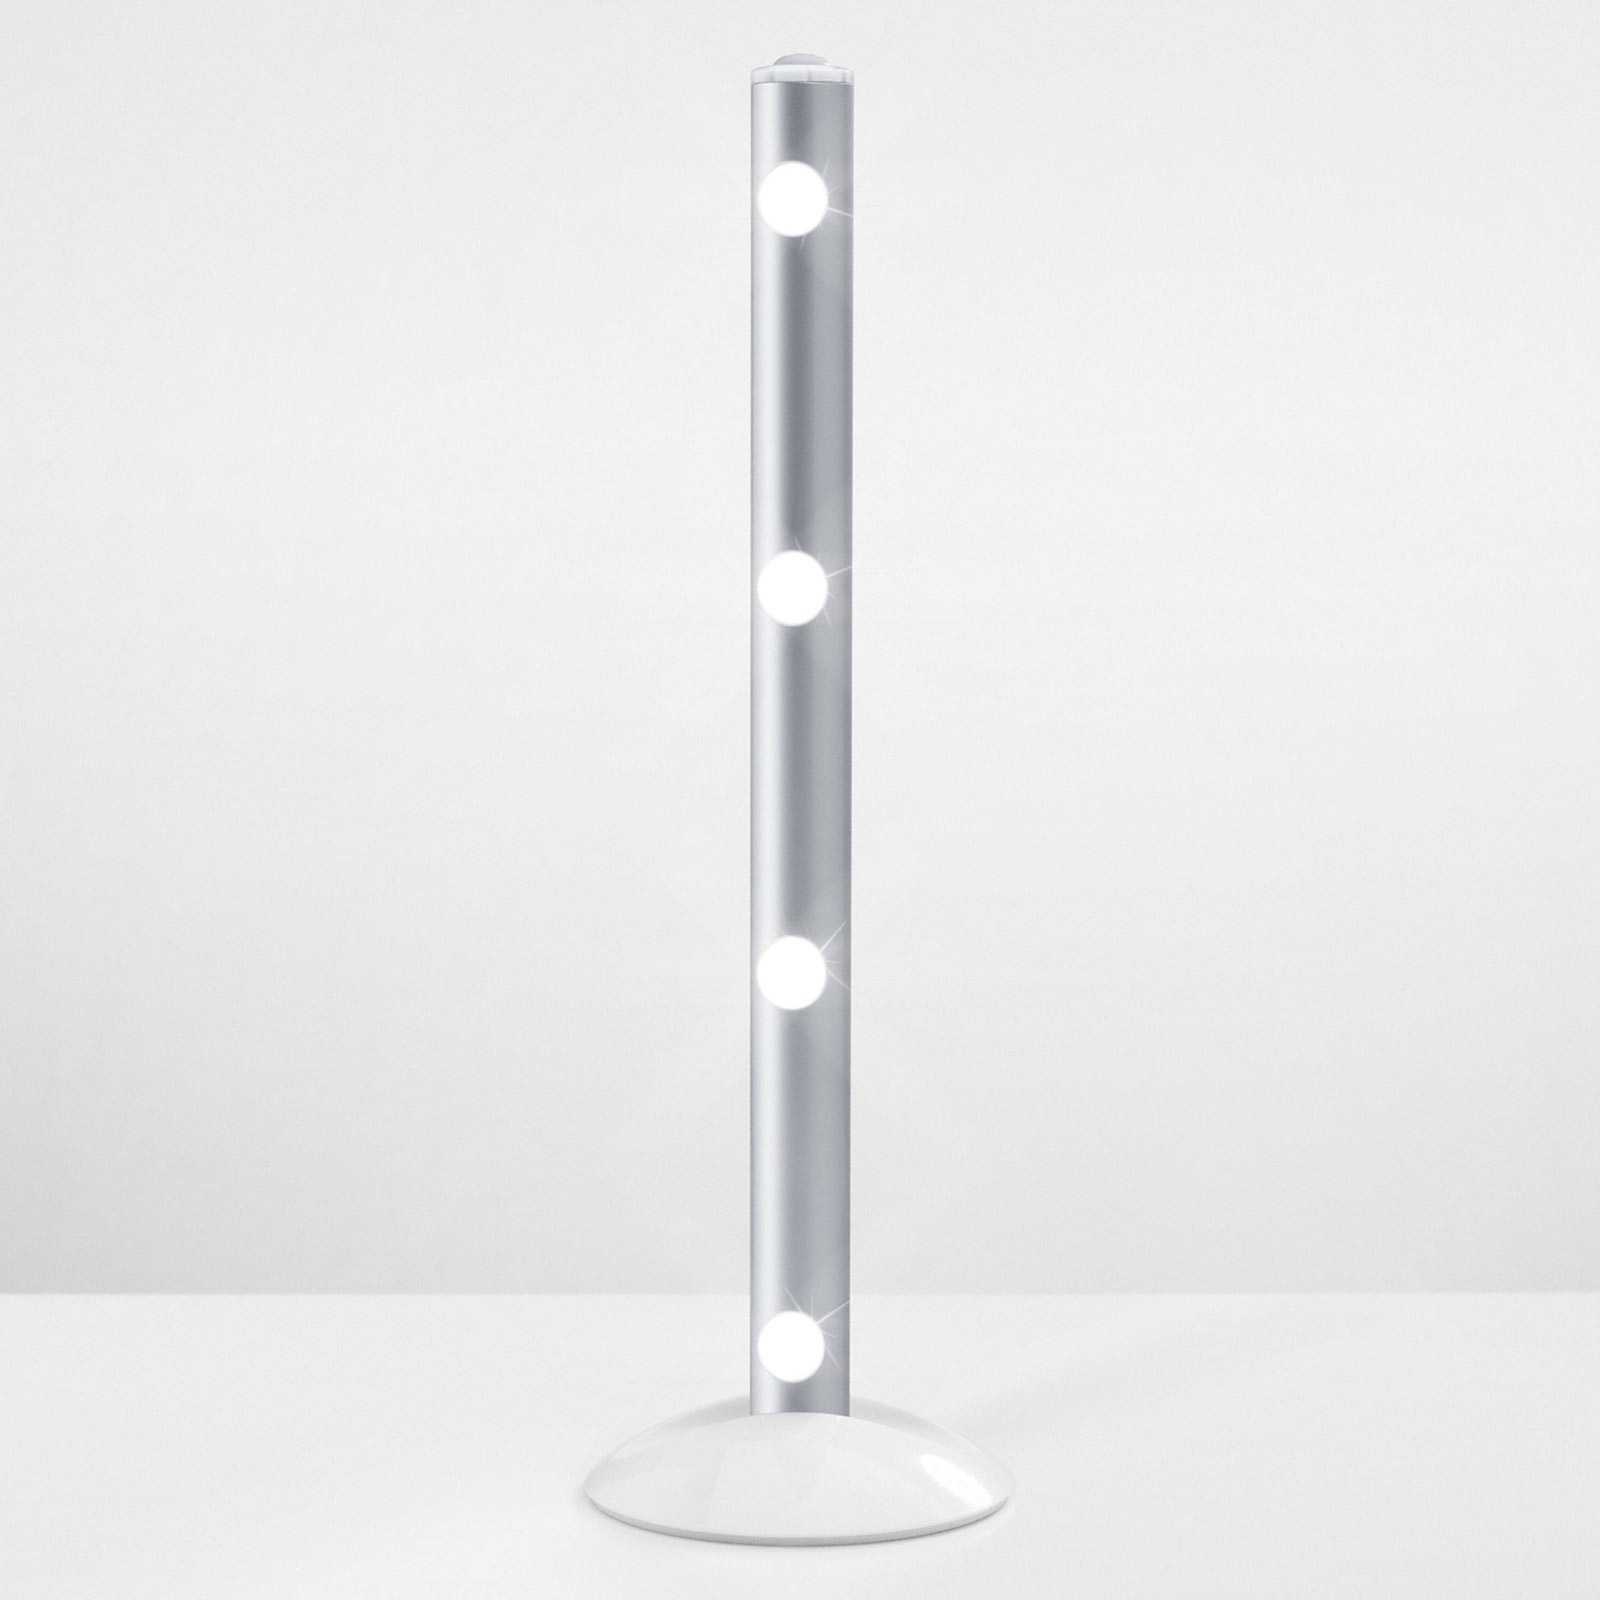 LEDVANCE LEDstixx varilla para pared o mesa